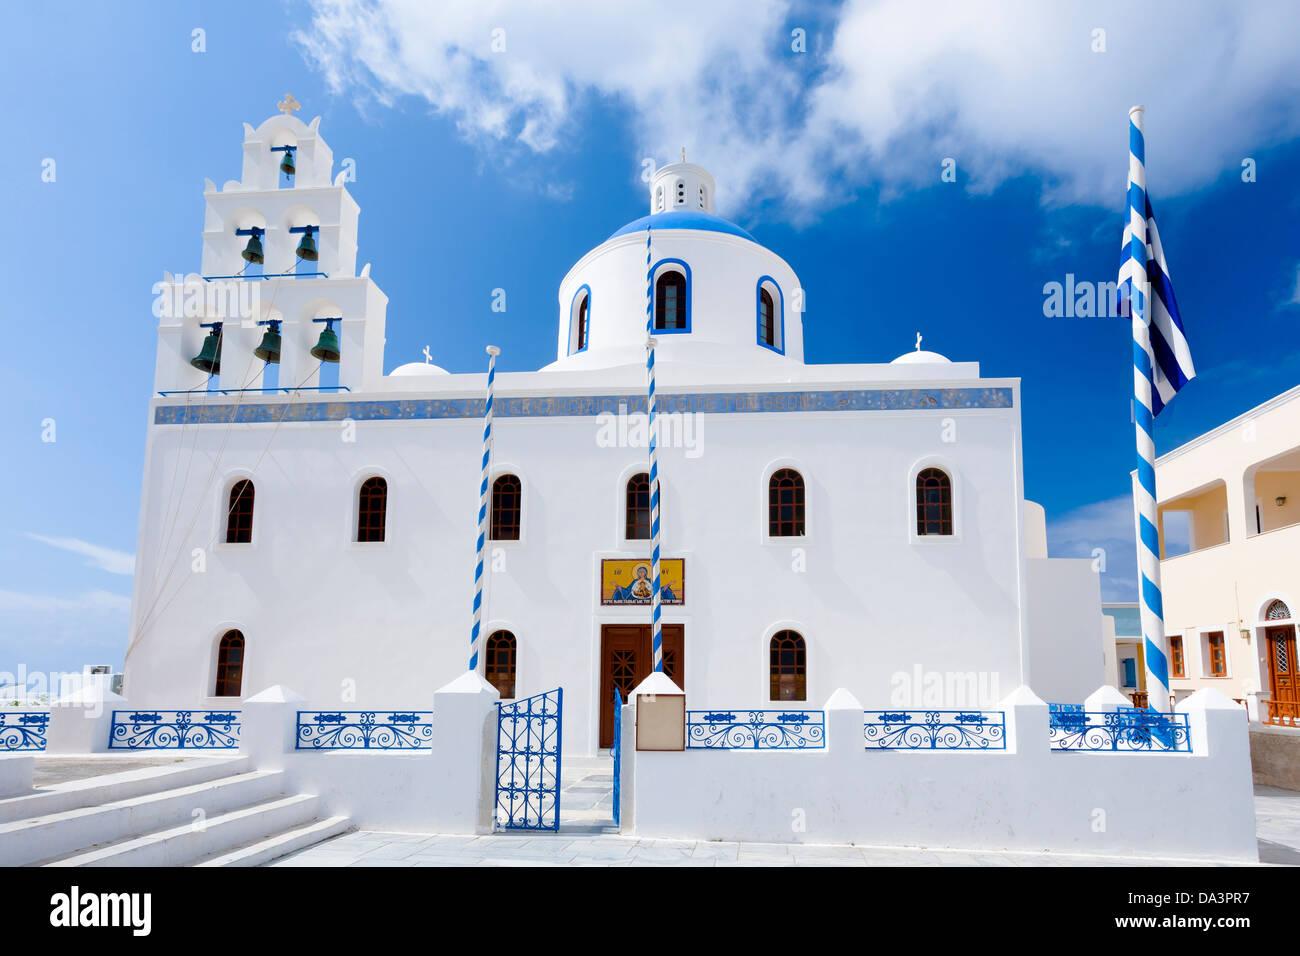 Greek orthodox church in the town of Oia Santorini Greece Europe - Stock Image